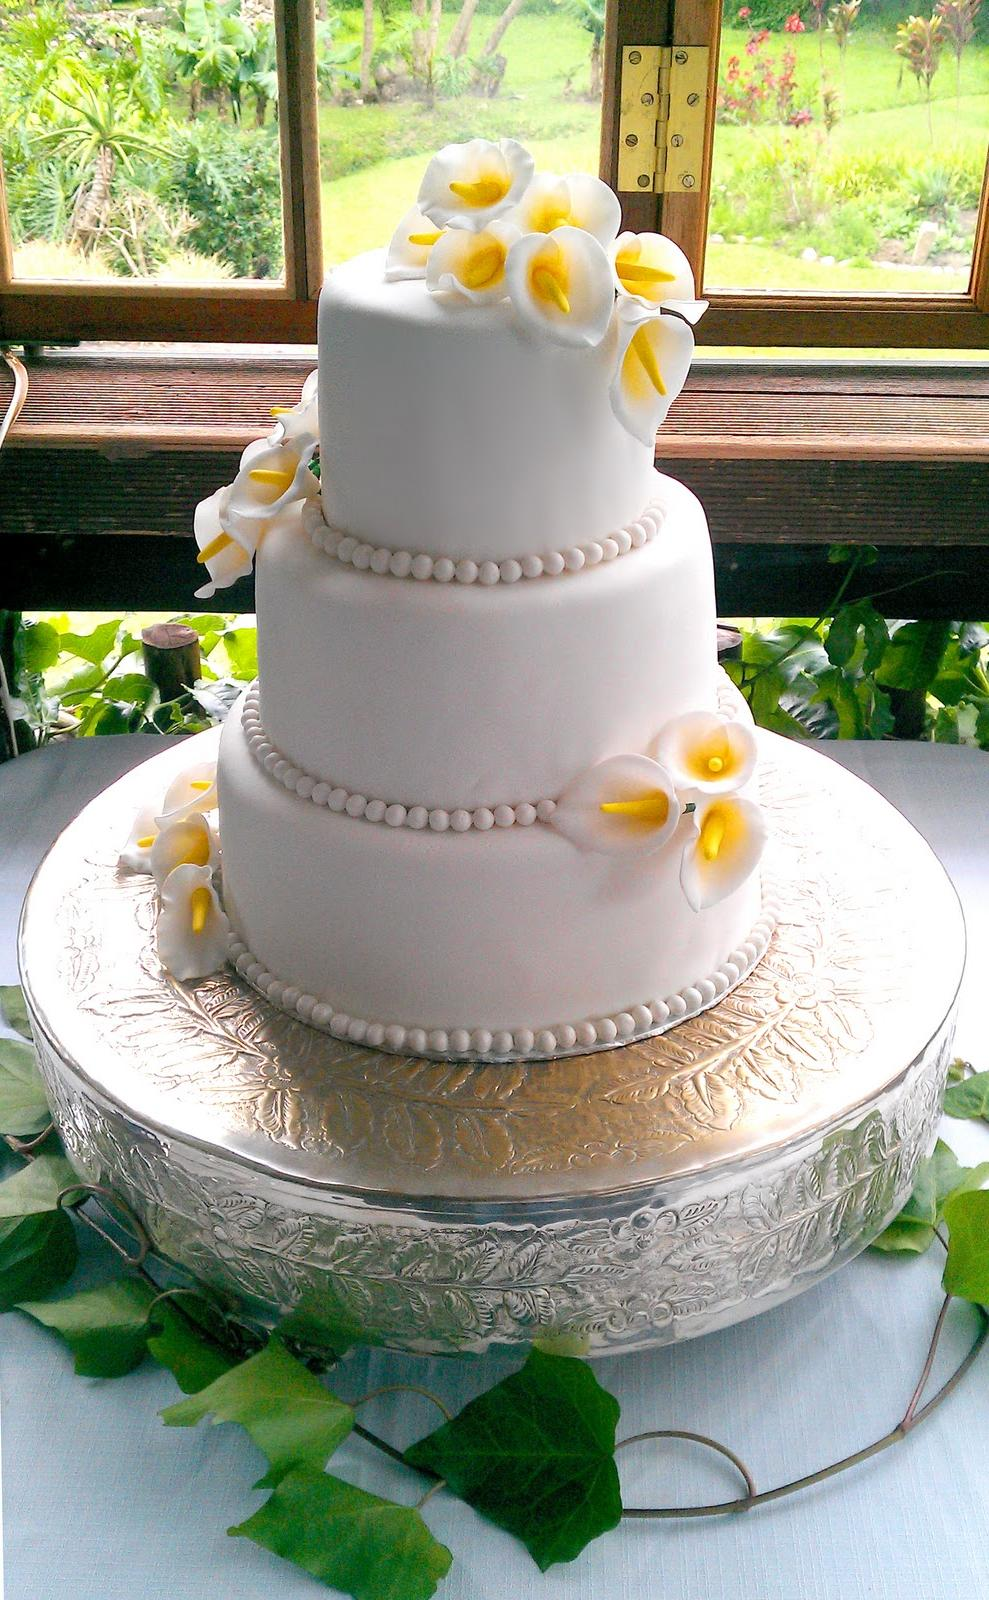 3 Tier Arum Lily Wedding Cake